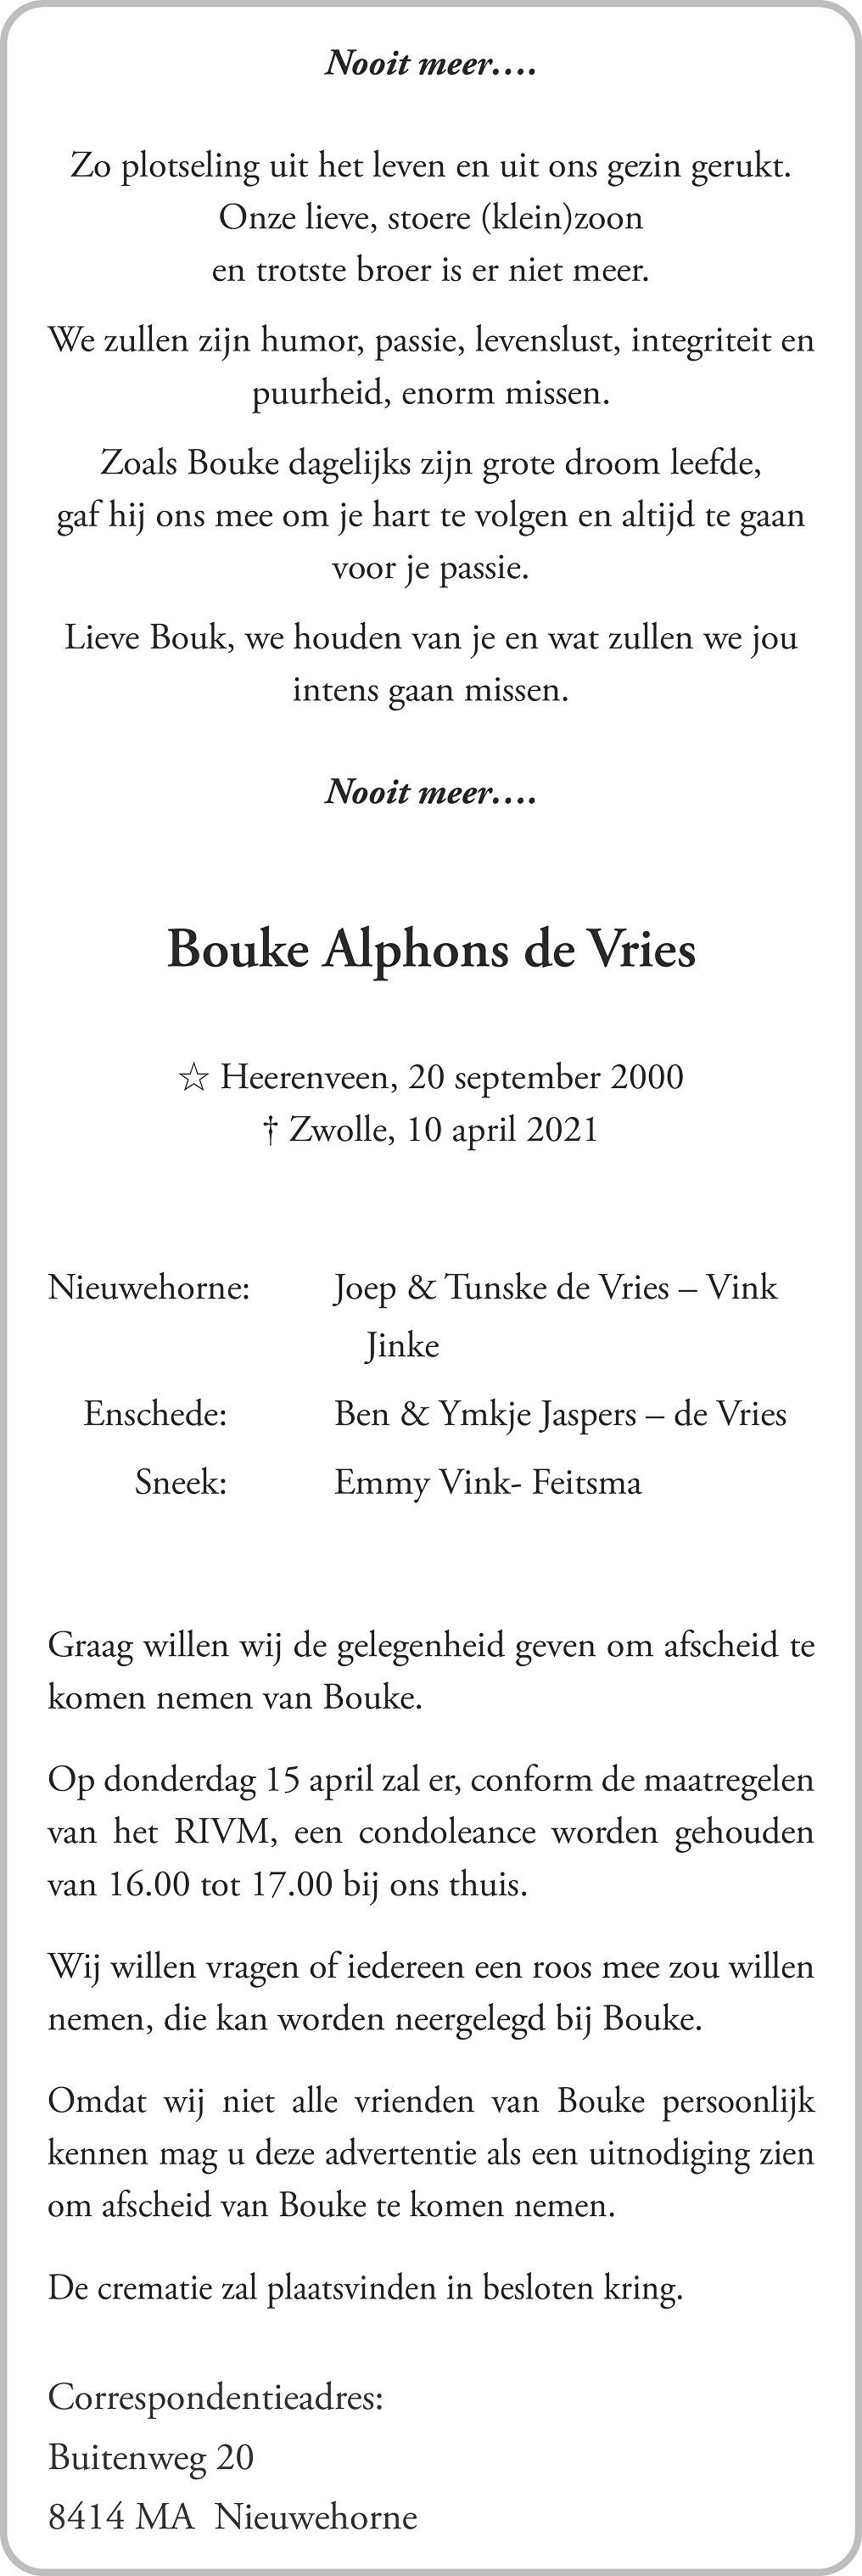 Bouke Alphons De Vries Death notice